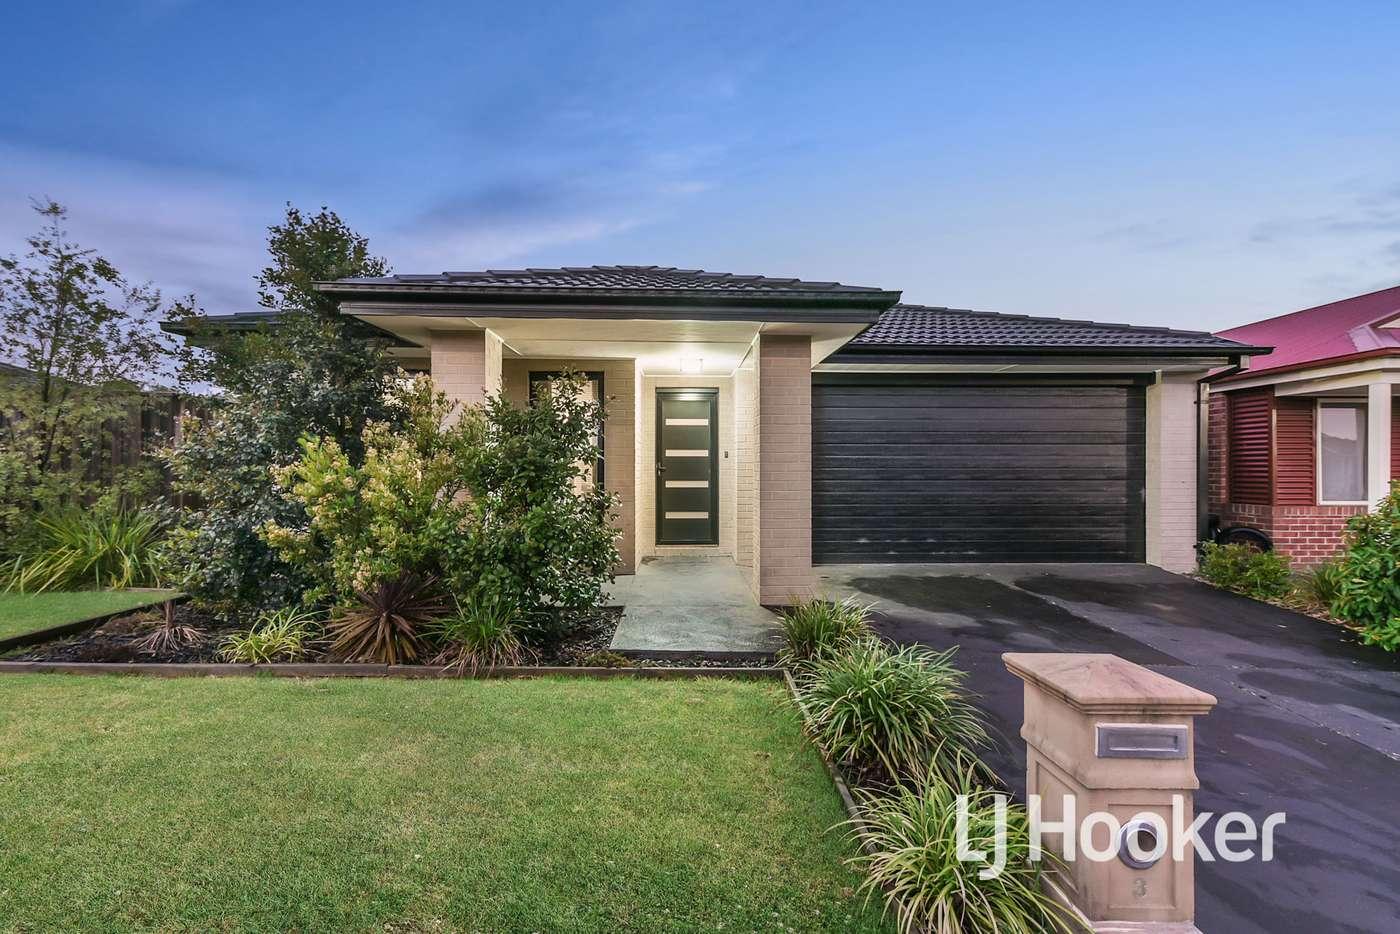 Main view of Homely house listing, 3 Tribuzi Close, Pakenham VIC 3810